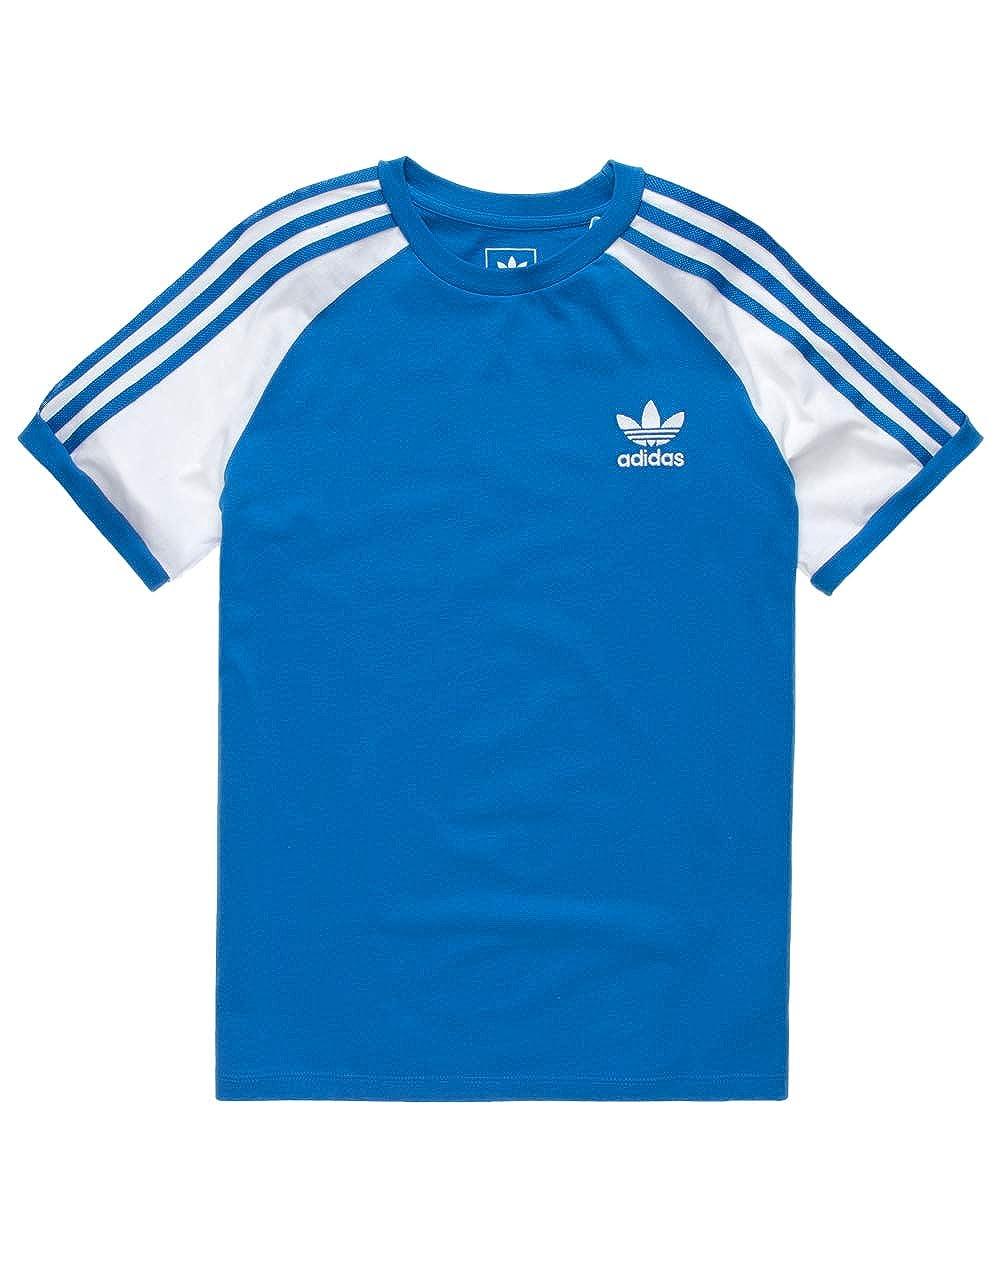 : adidas Originals California Short Sleeve T Shirt